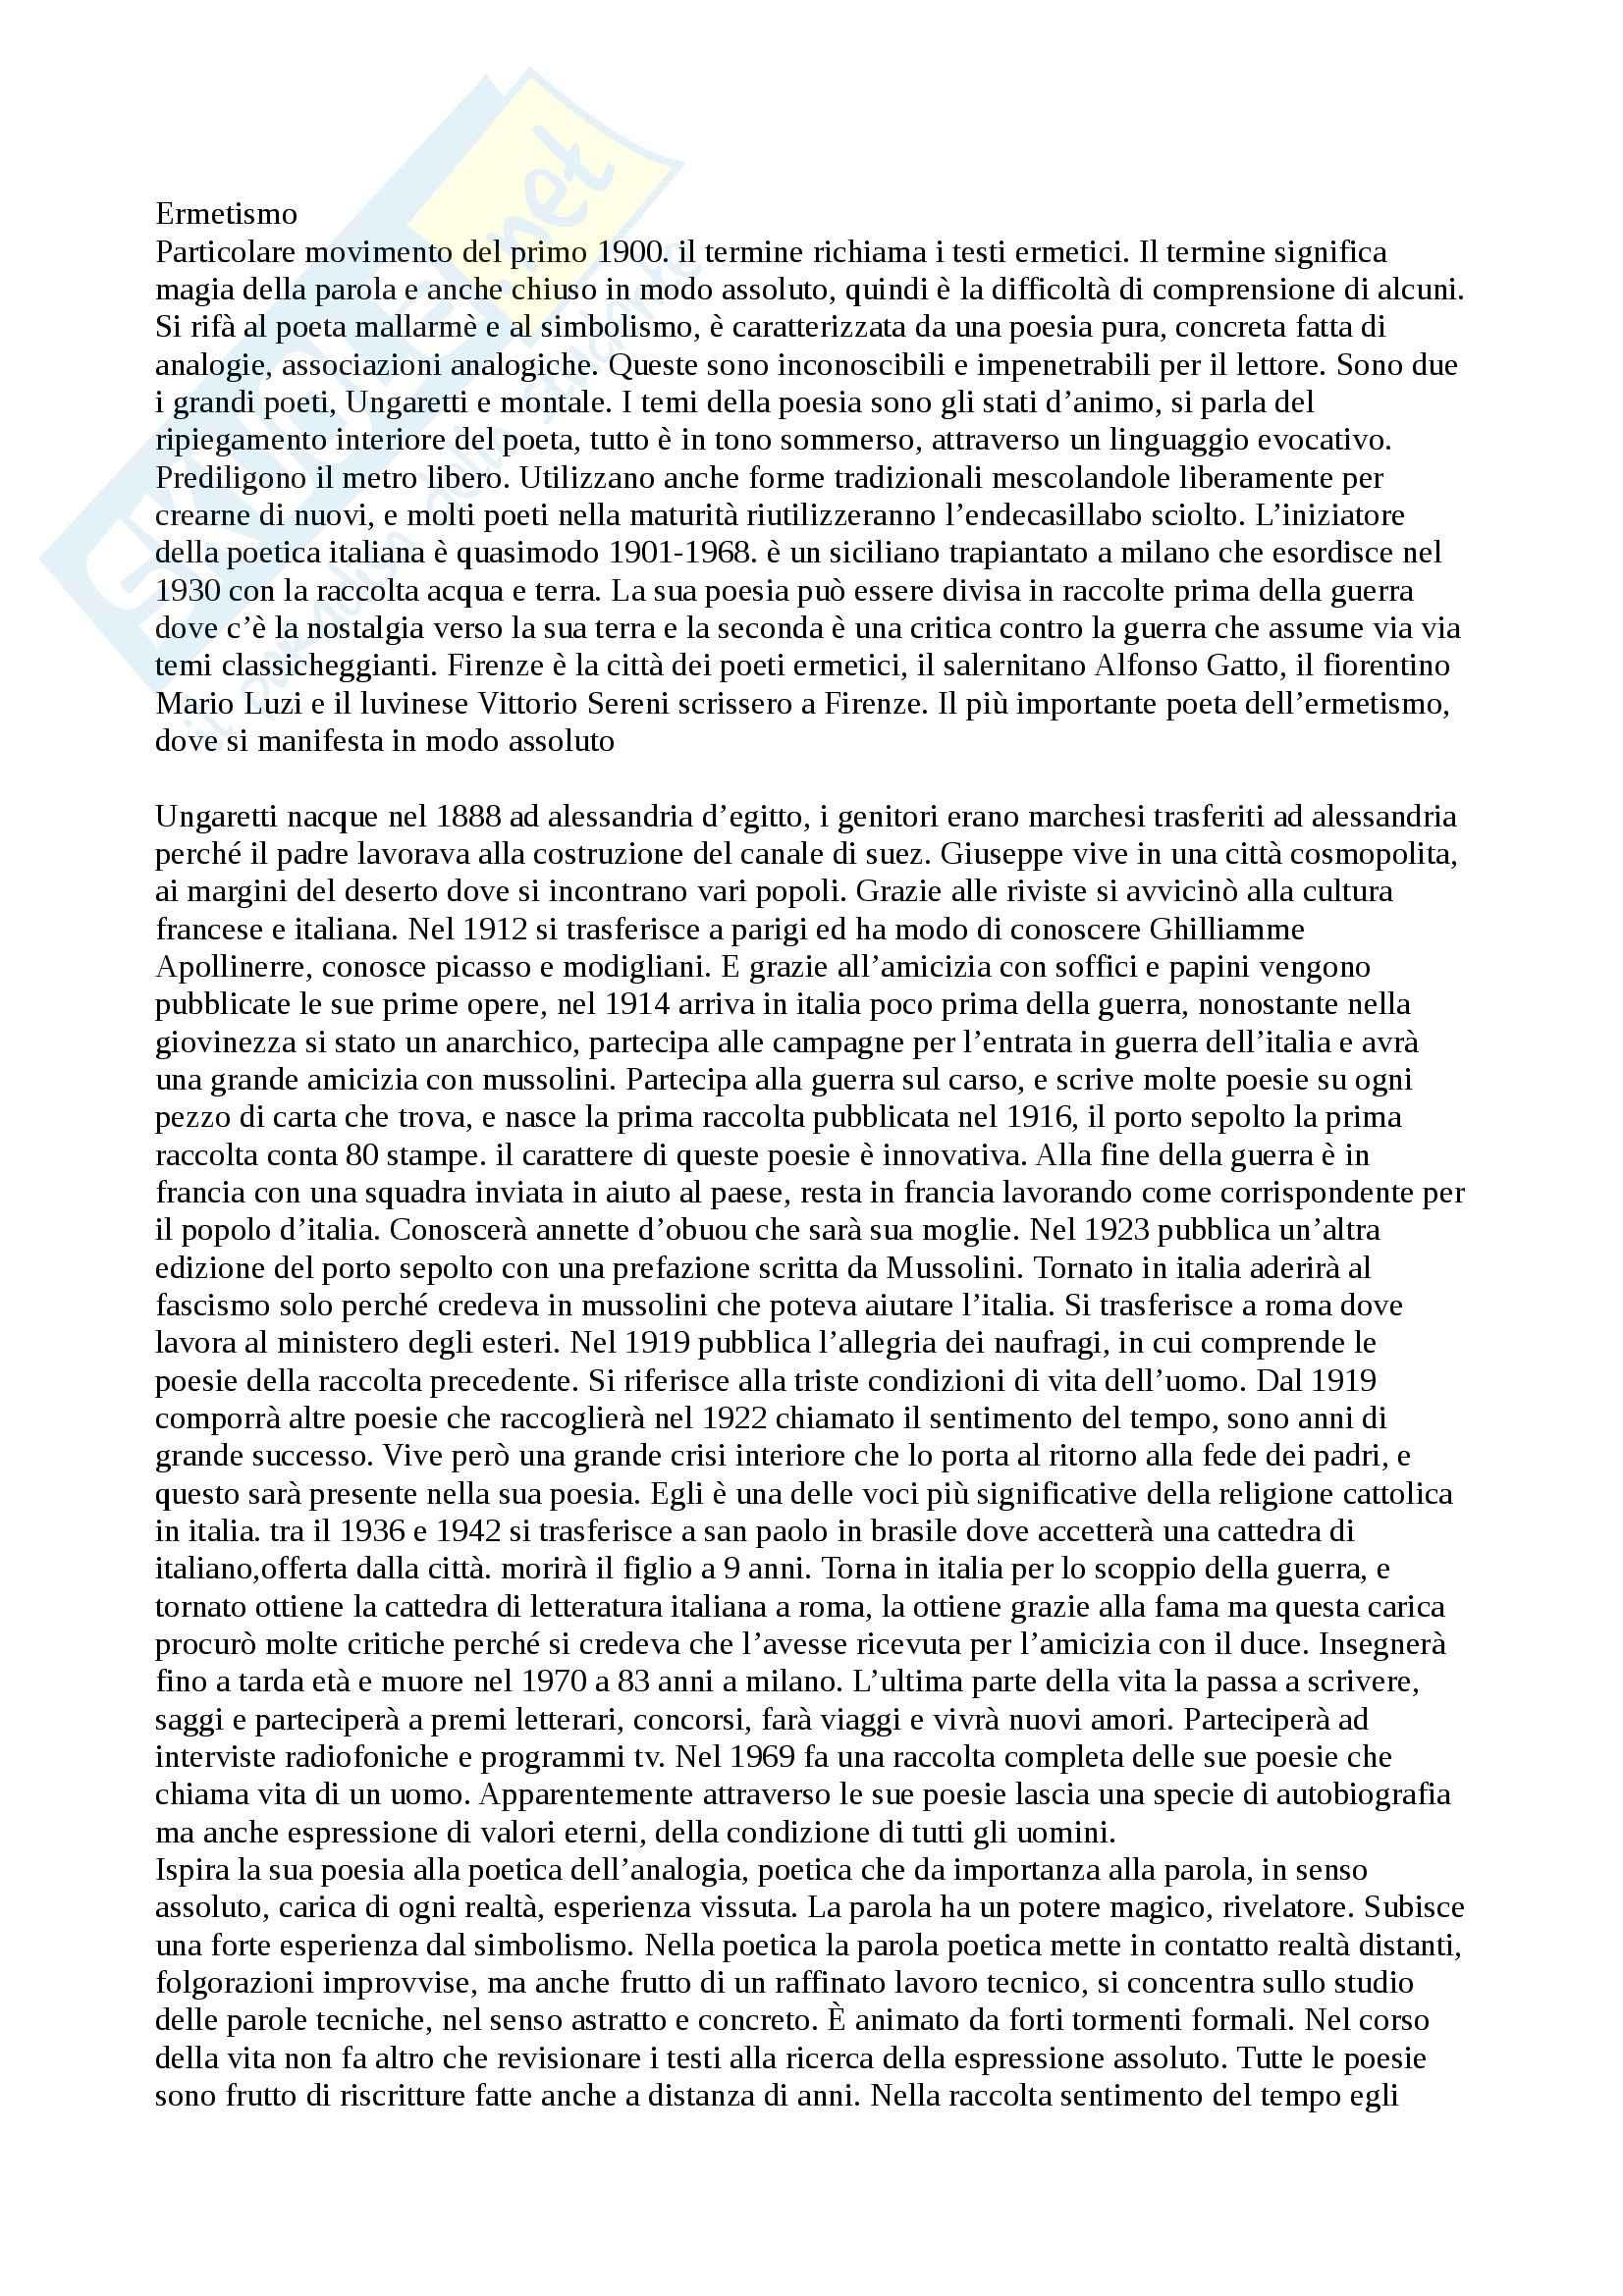 Ermetismo - Appunti